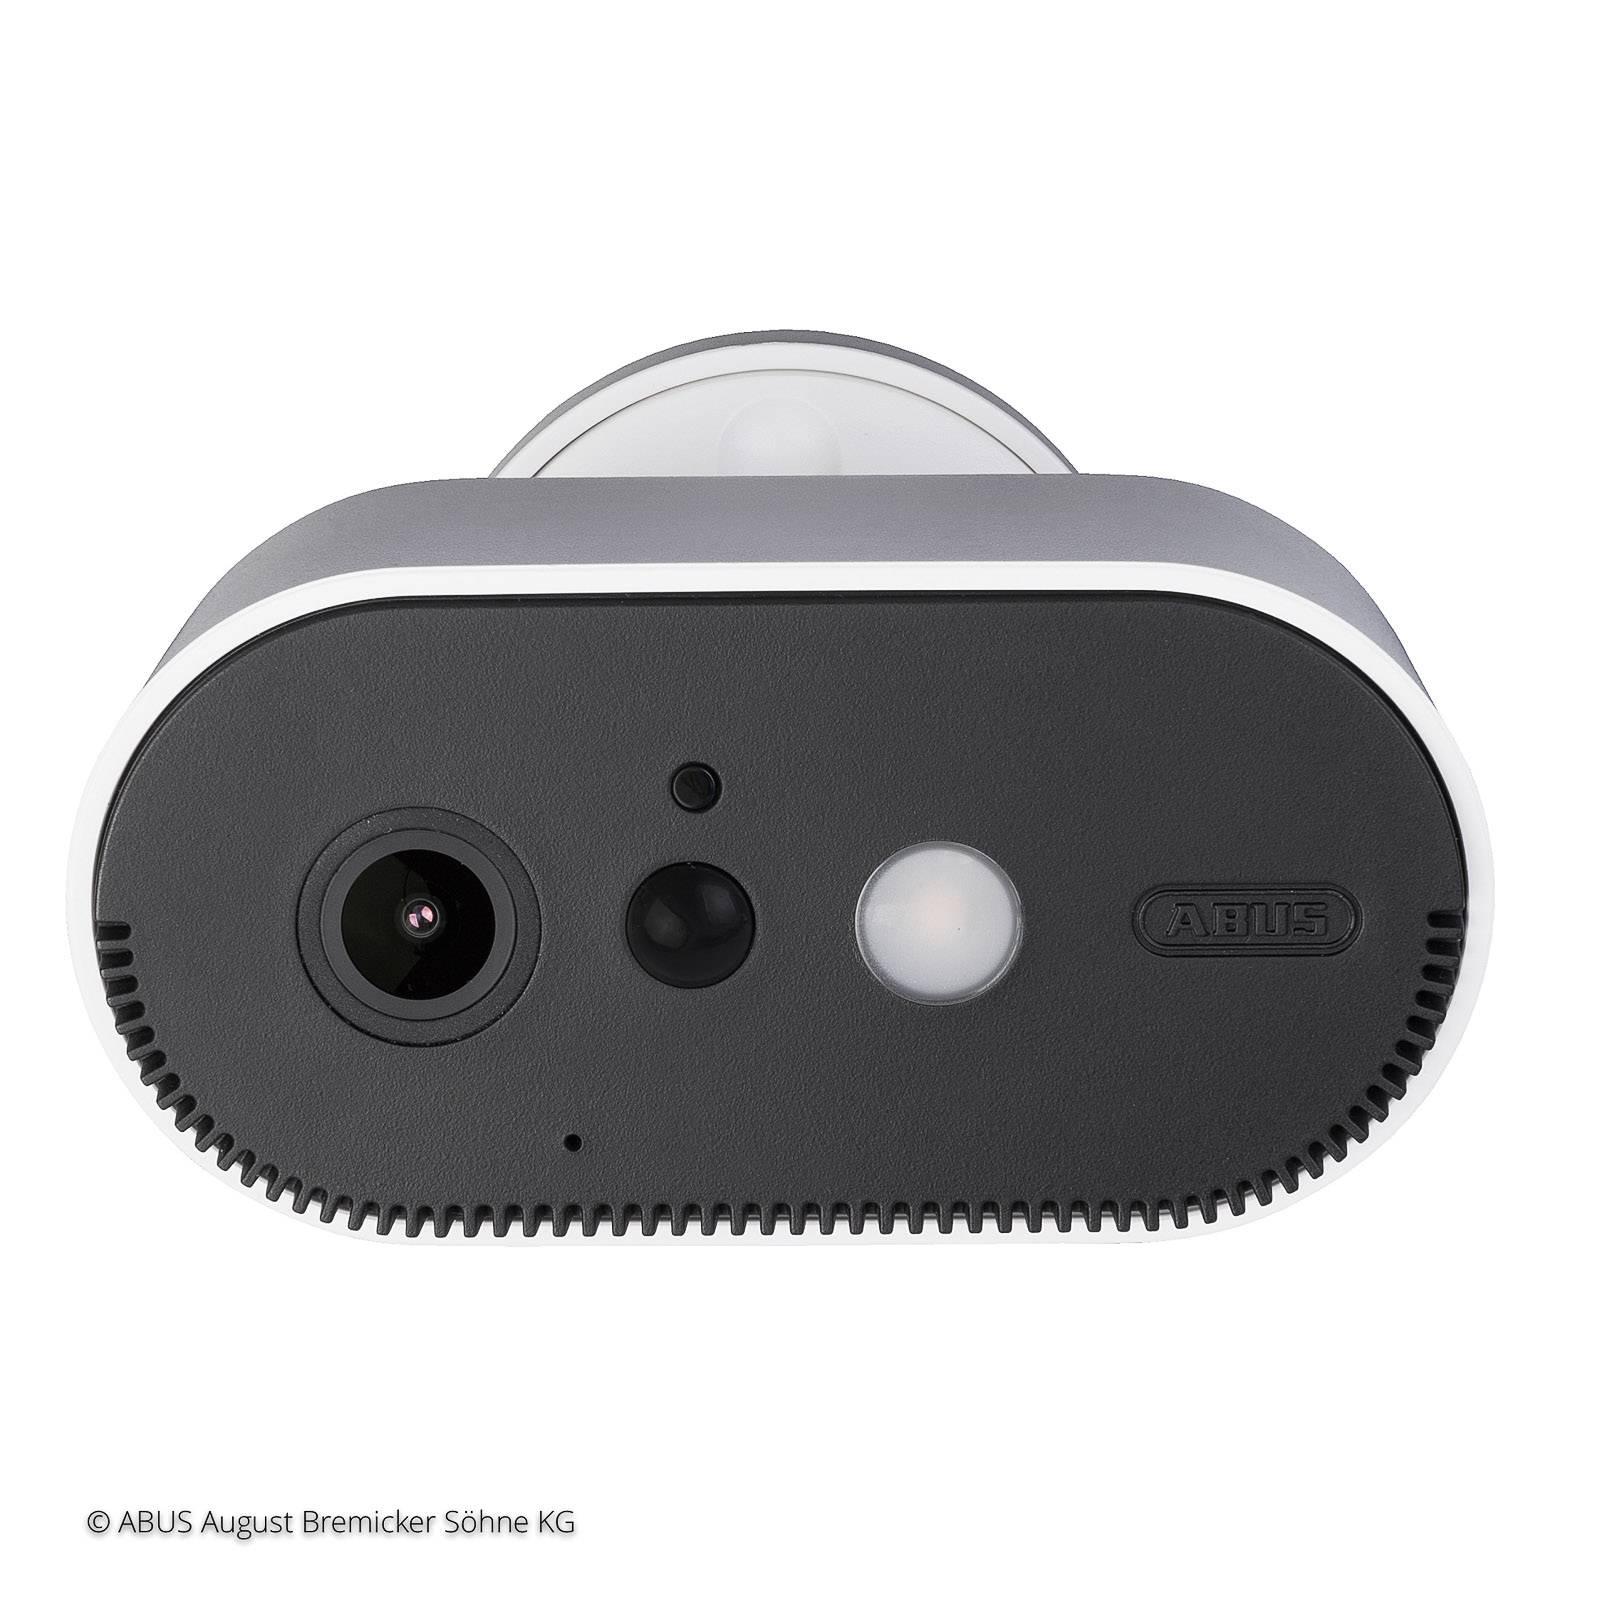 ABUS Akku Außenkamera, kabellos, Zusatz-Kamera